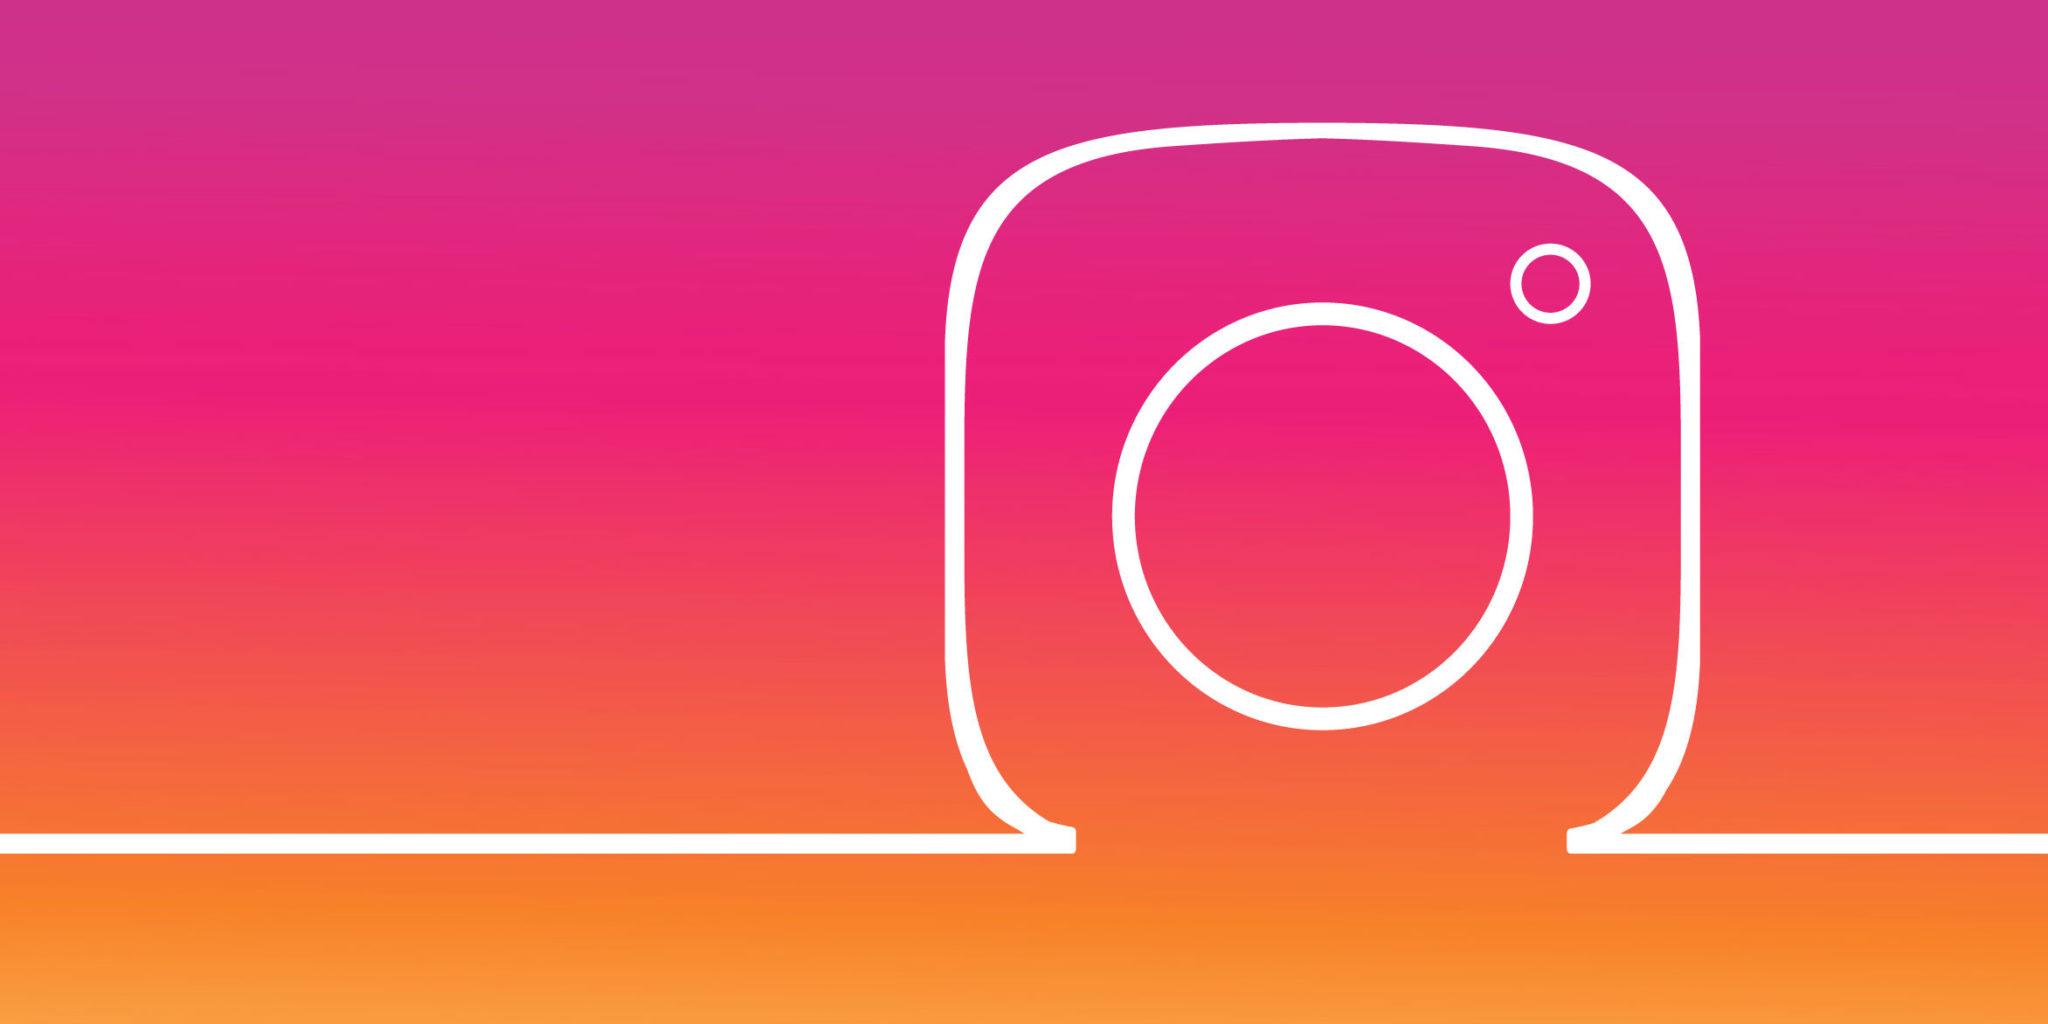 instagram password finder